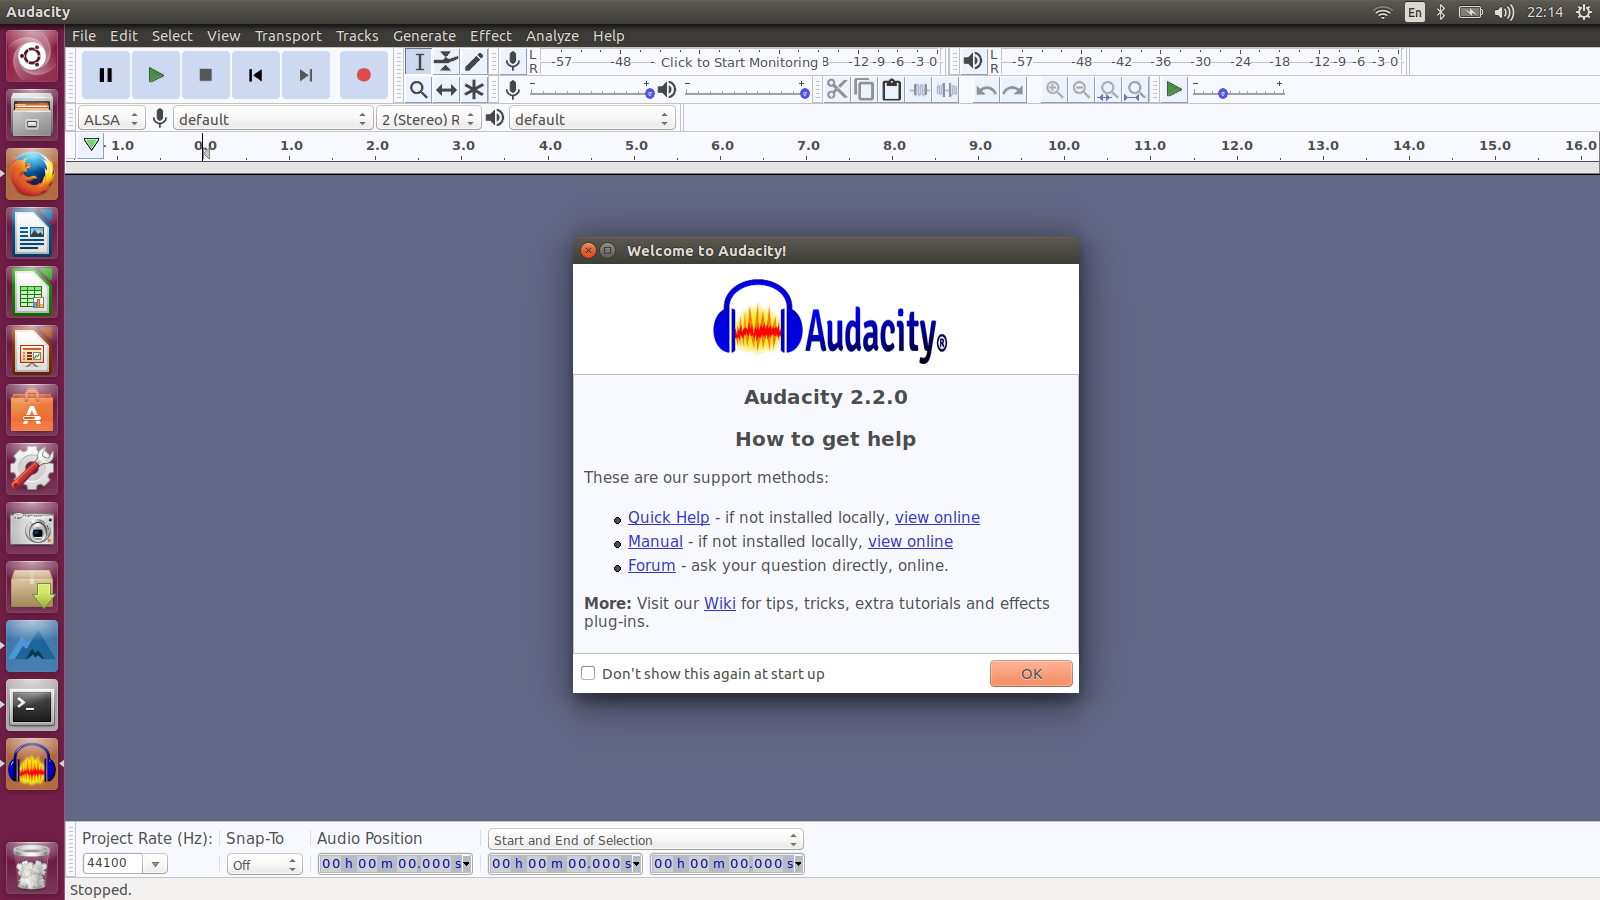 how to install program on ubuntu how to install audacity 2 2 0 via